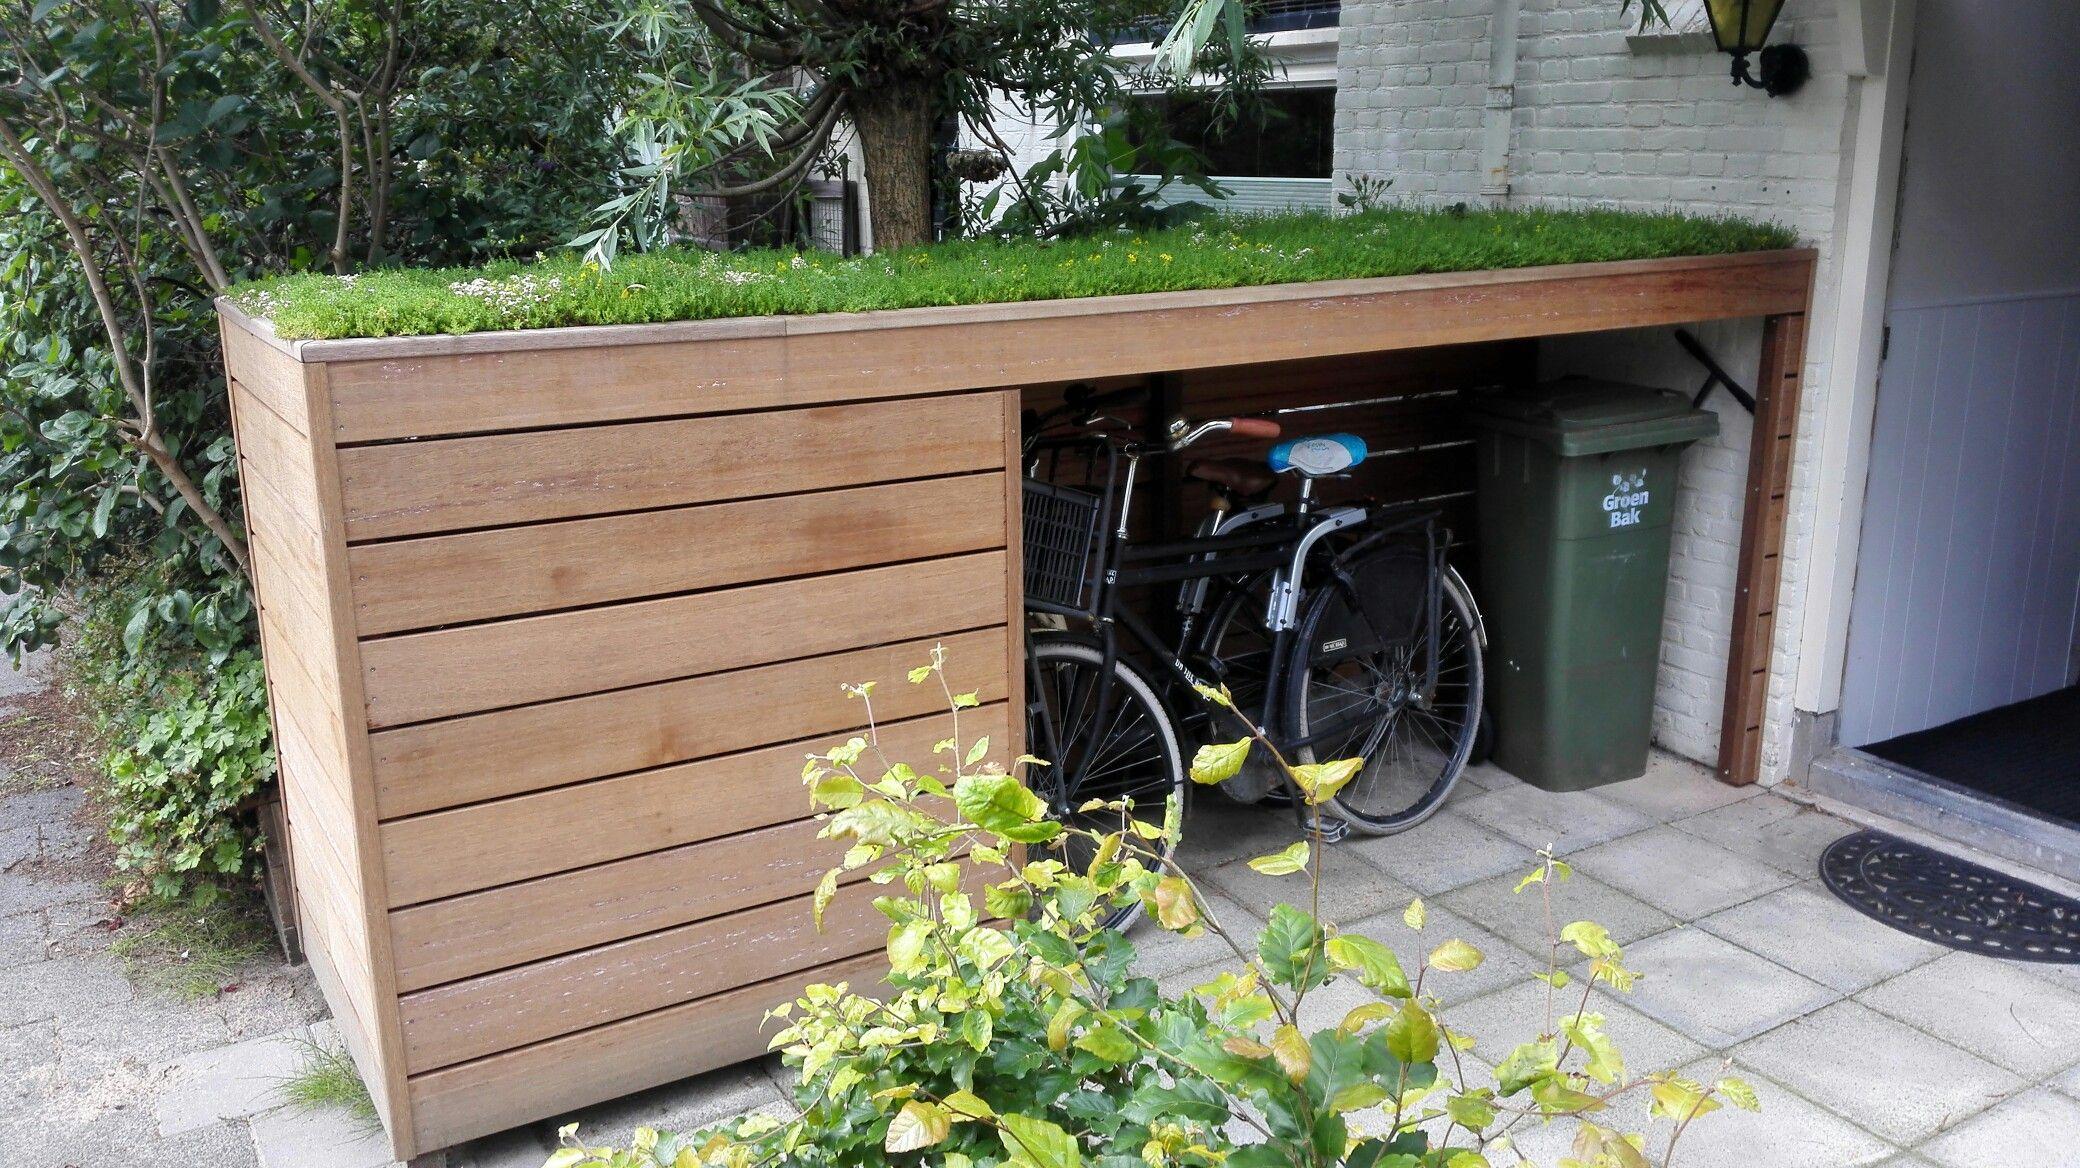 Fietsenberging Met Groen Dak | Abri Vélo, Rangement Terrasse ... dedans Abri Jardin Moderne